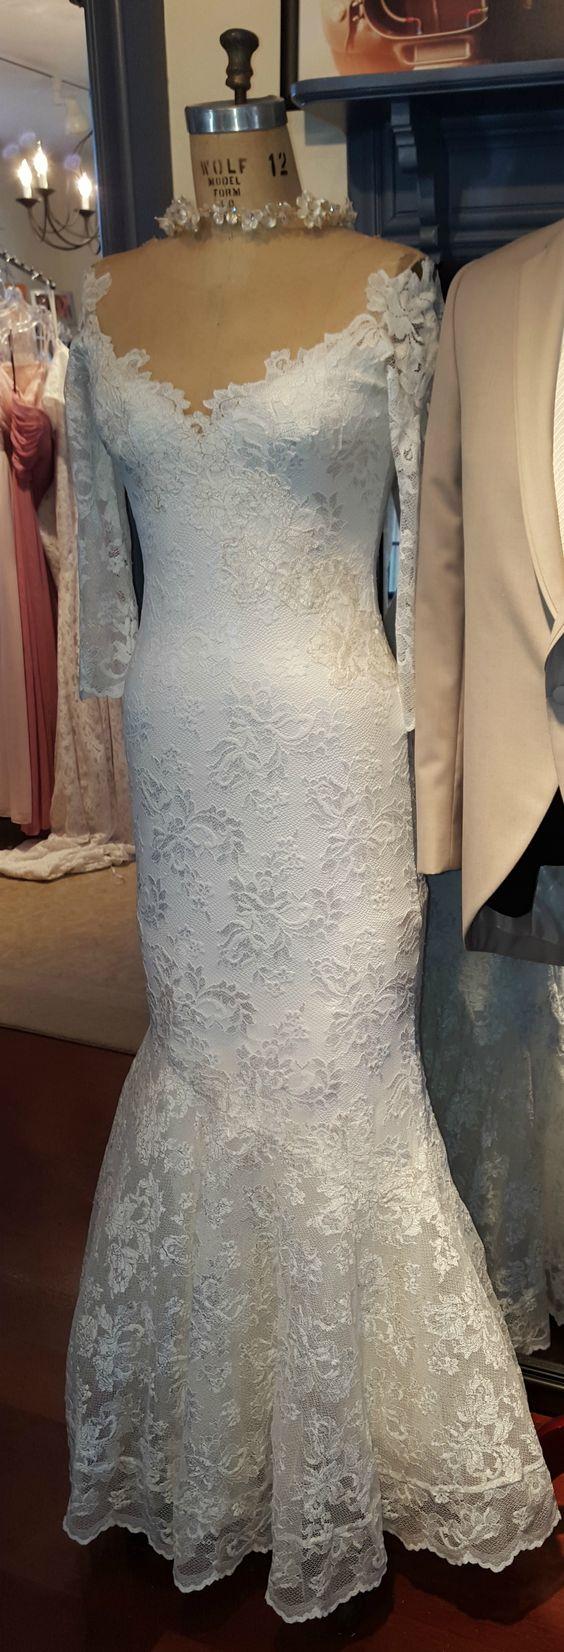 Olvi39s trend stretch lace bridal gown www for Stretch lace wedding dress